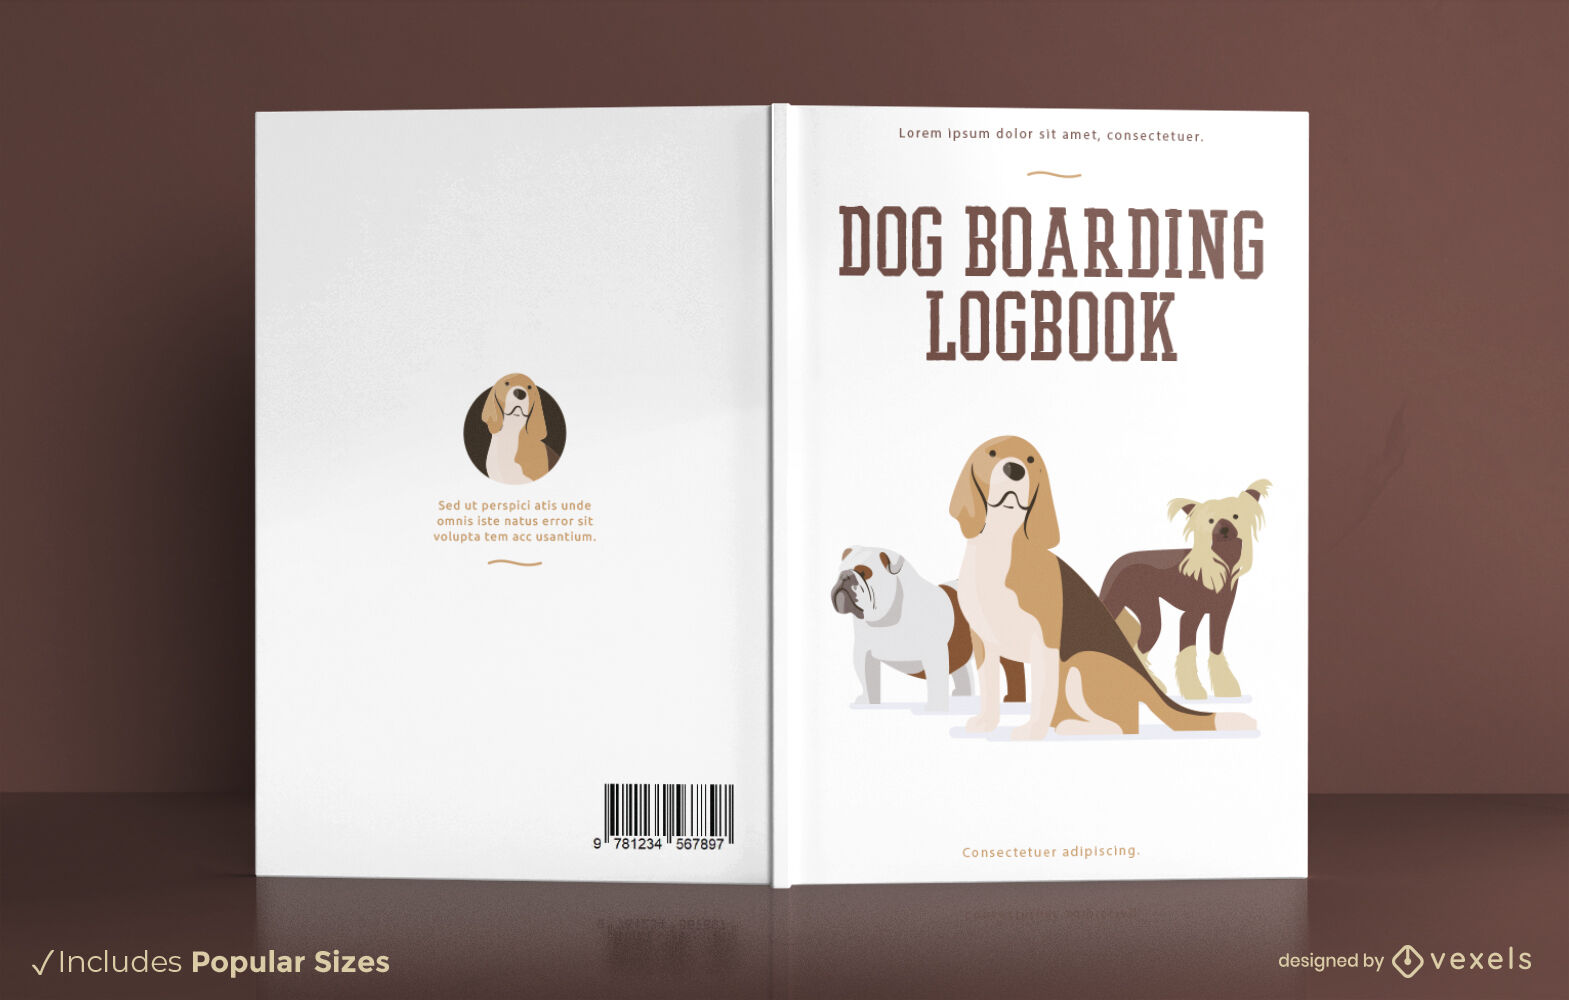 Buchcover-Design f?r Hunderassen